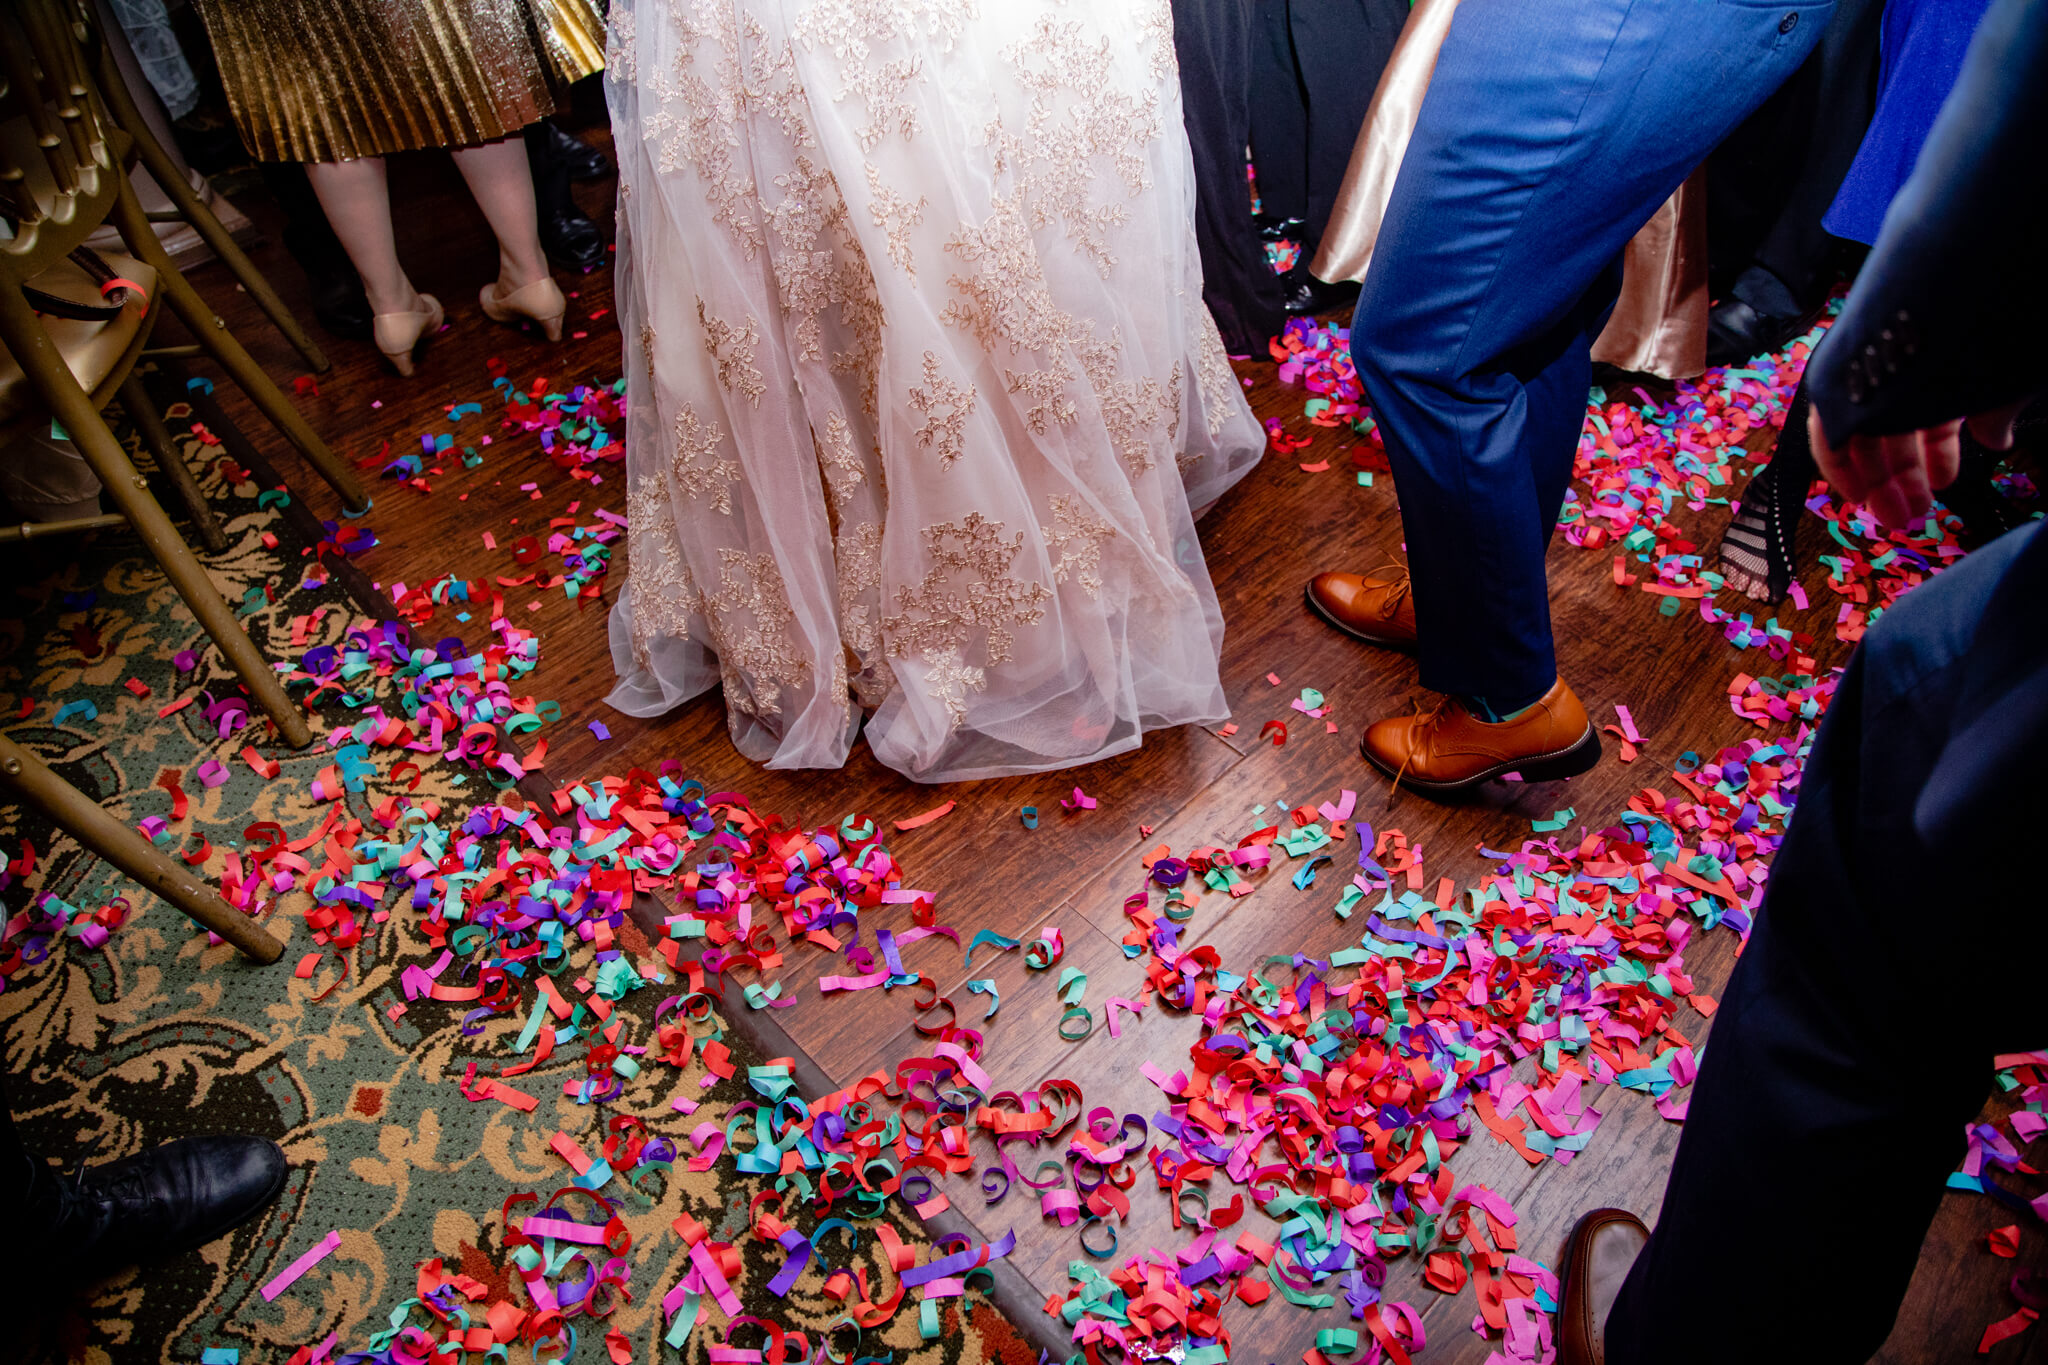 Melissa Jill New Years Eve 2017 Ceresville Mansion Confetti Celebration NYE21.jpg